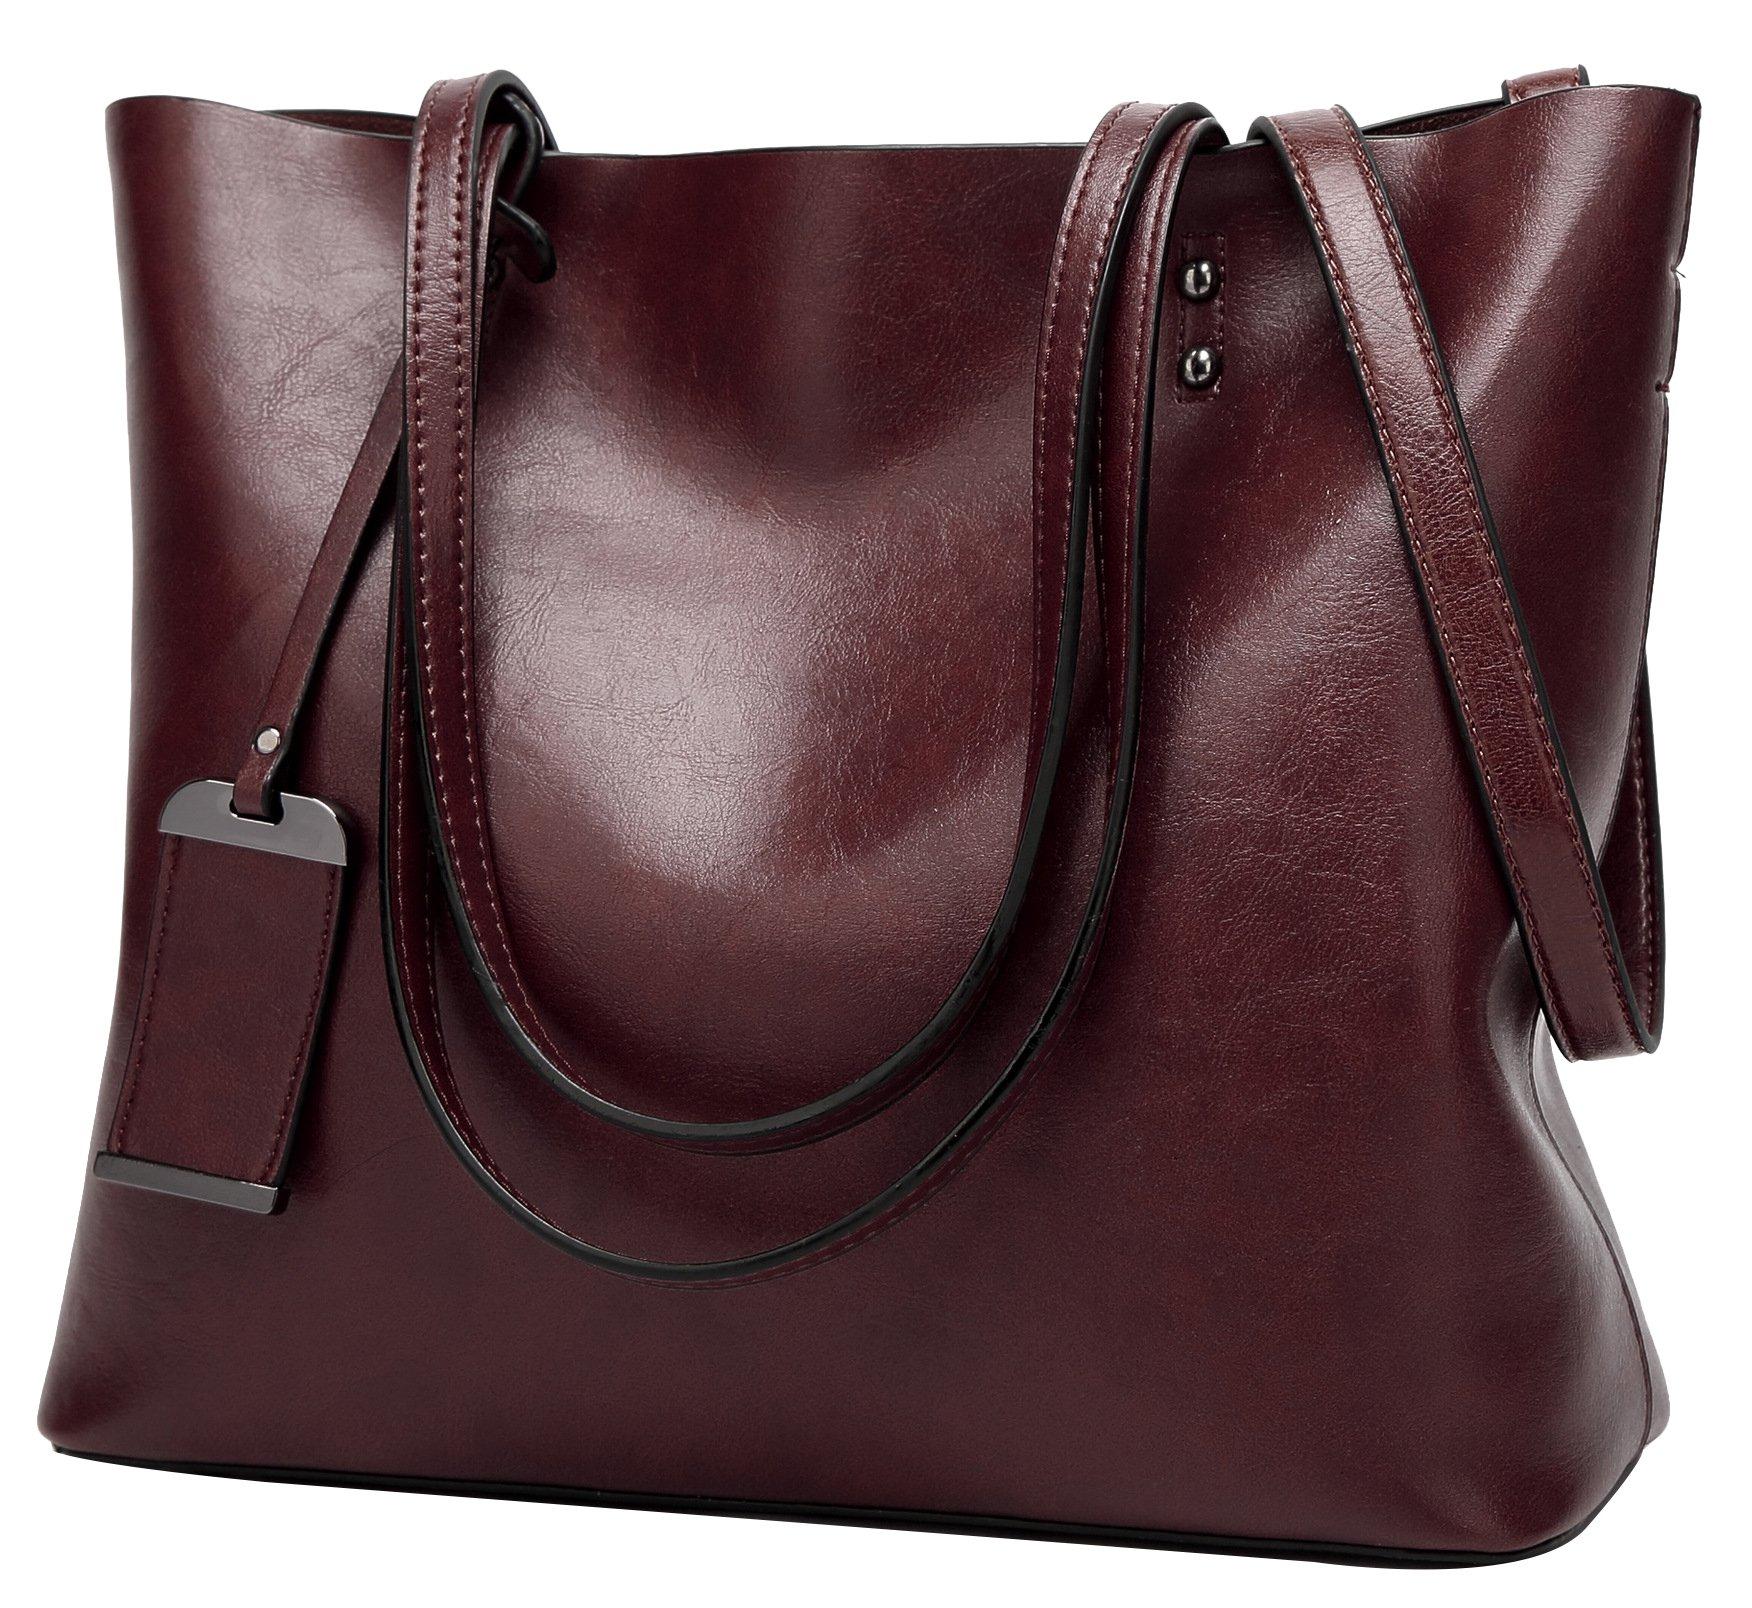 ilishop Oil PU Leather Handbag Vintage Designer Purse Classical Tote Bag Large Capacity Shoulder Bags (Coffee)